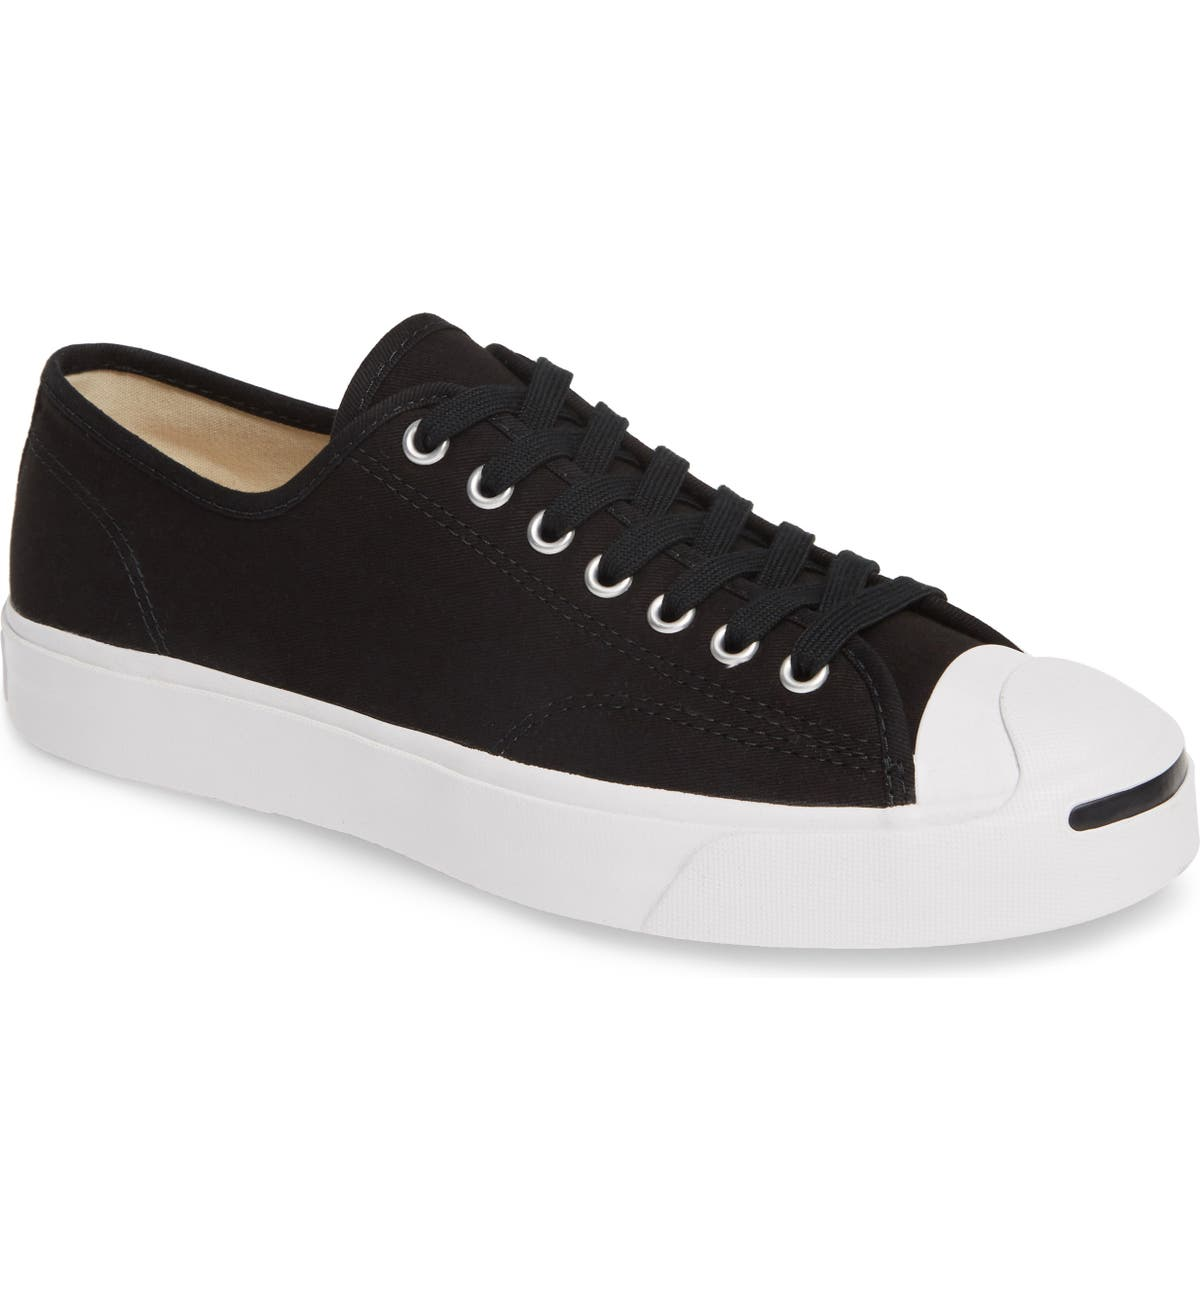 c02a0b9f04 Converse Jack Purcell Sneaker (Men)